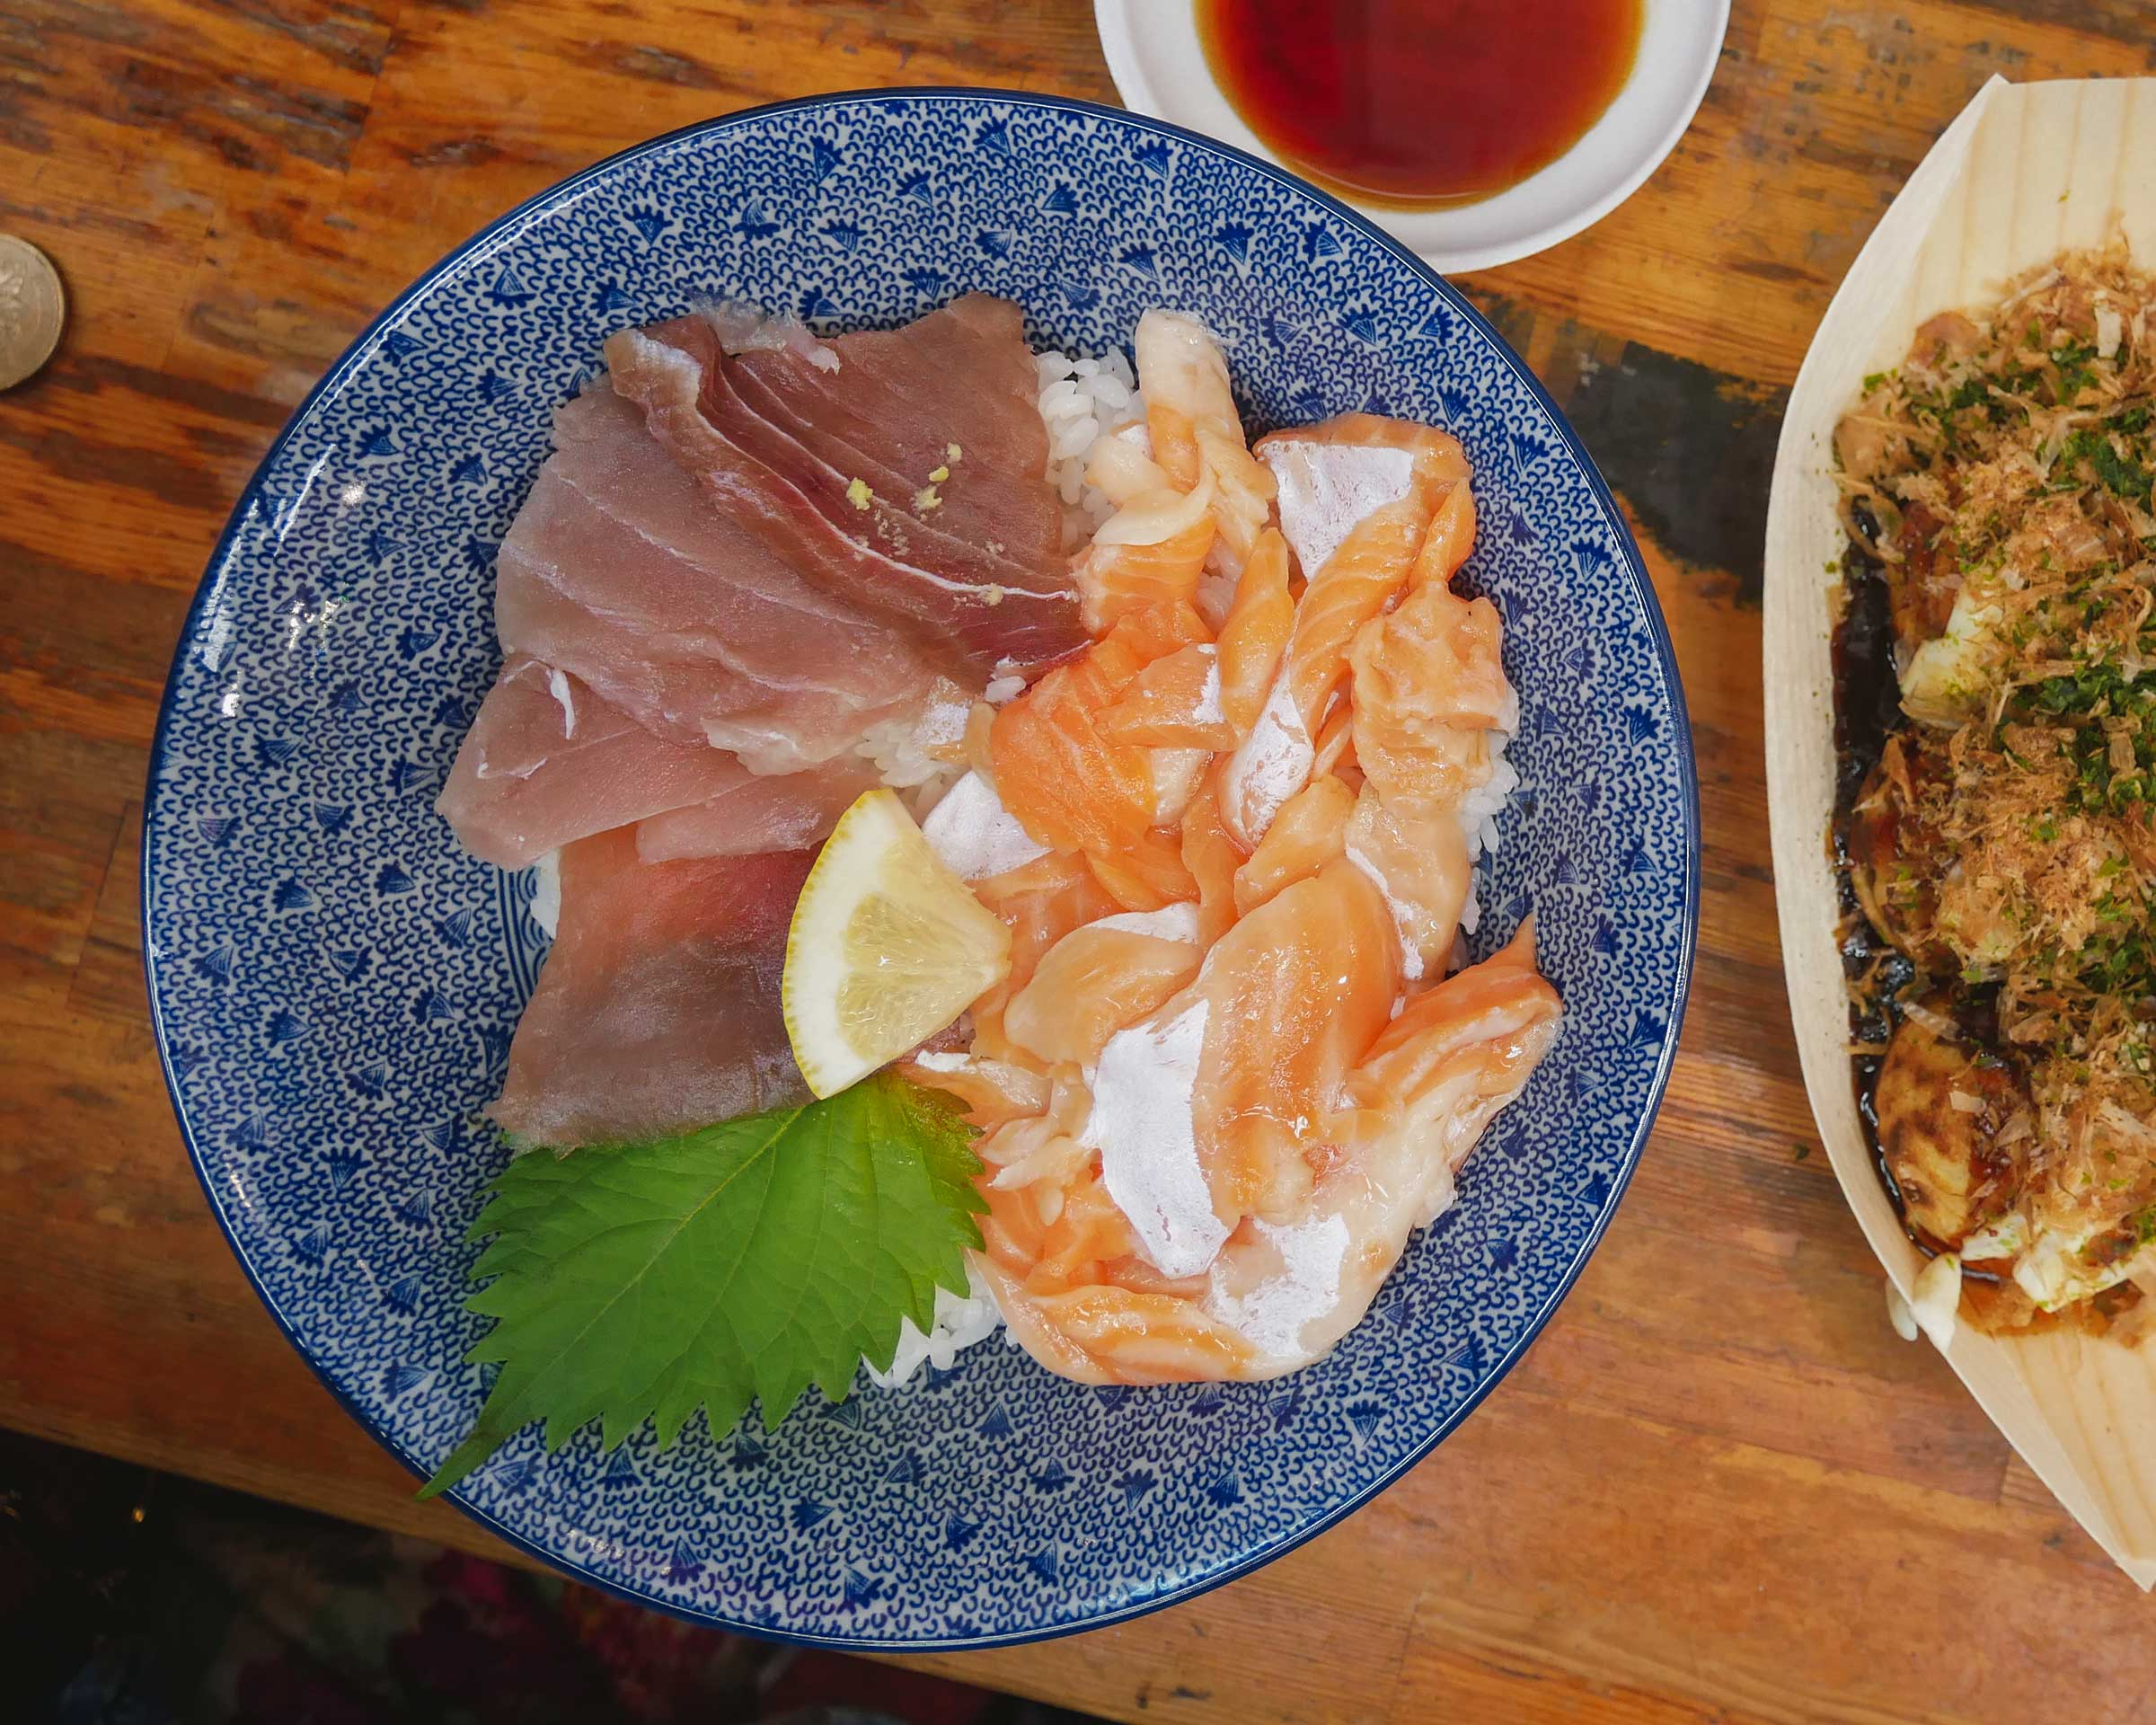 Seafood Rice Bowl at Minatoya (みなとや食品)